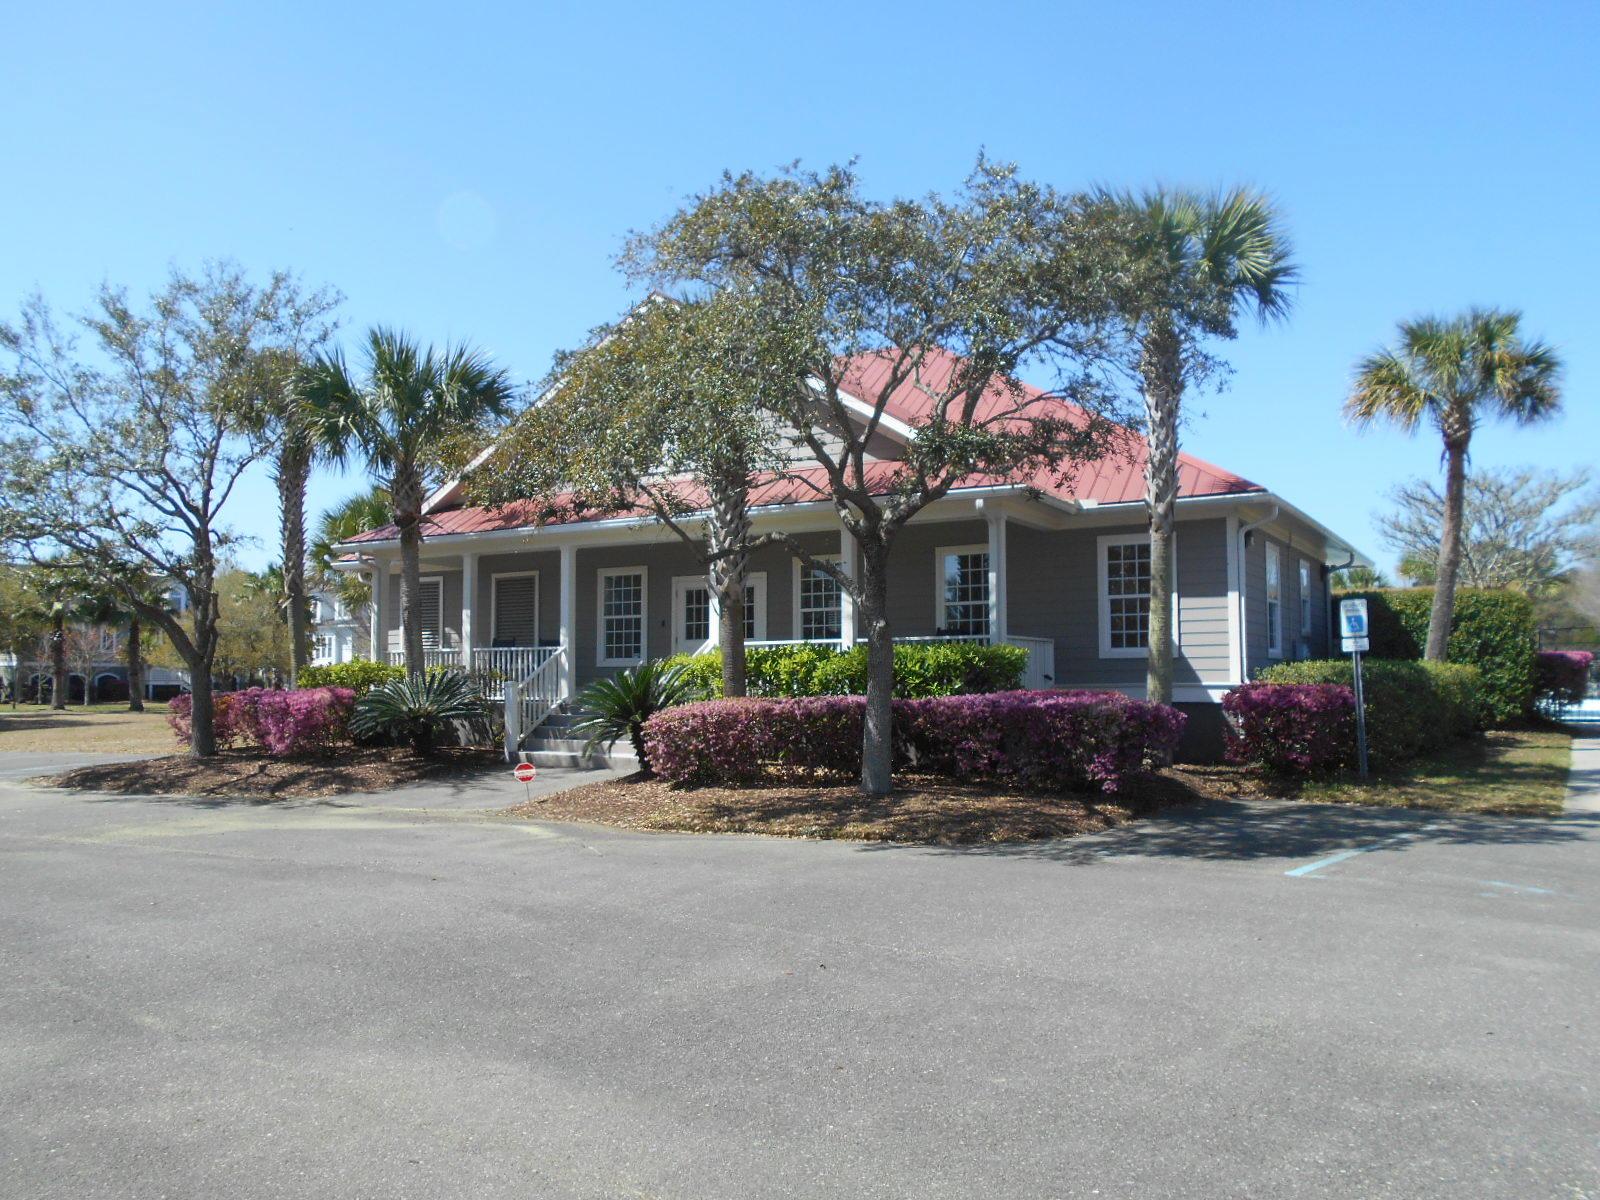 Beresford Creek Landing Homes For Sale - 1212 Winding Creek, Charleston, SC - 6